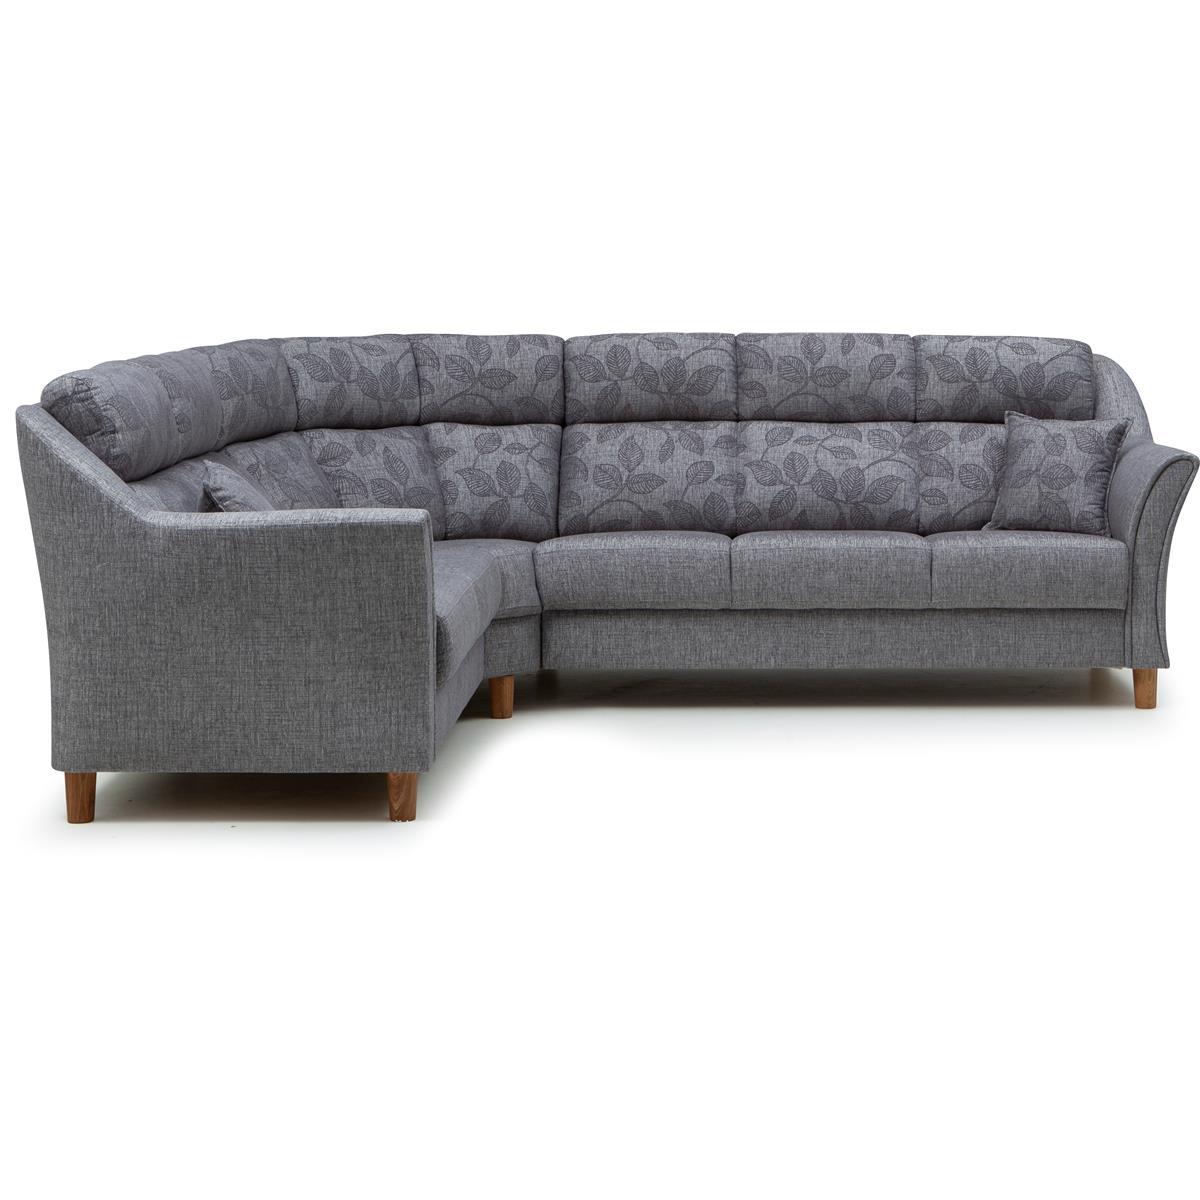 Malte-soffa-turin-asfalt